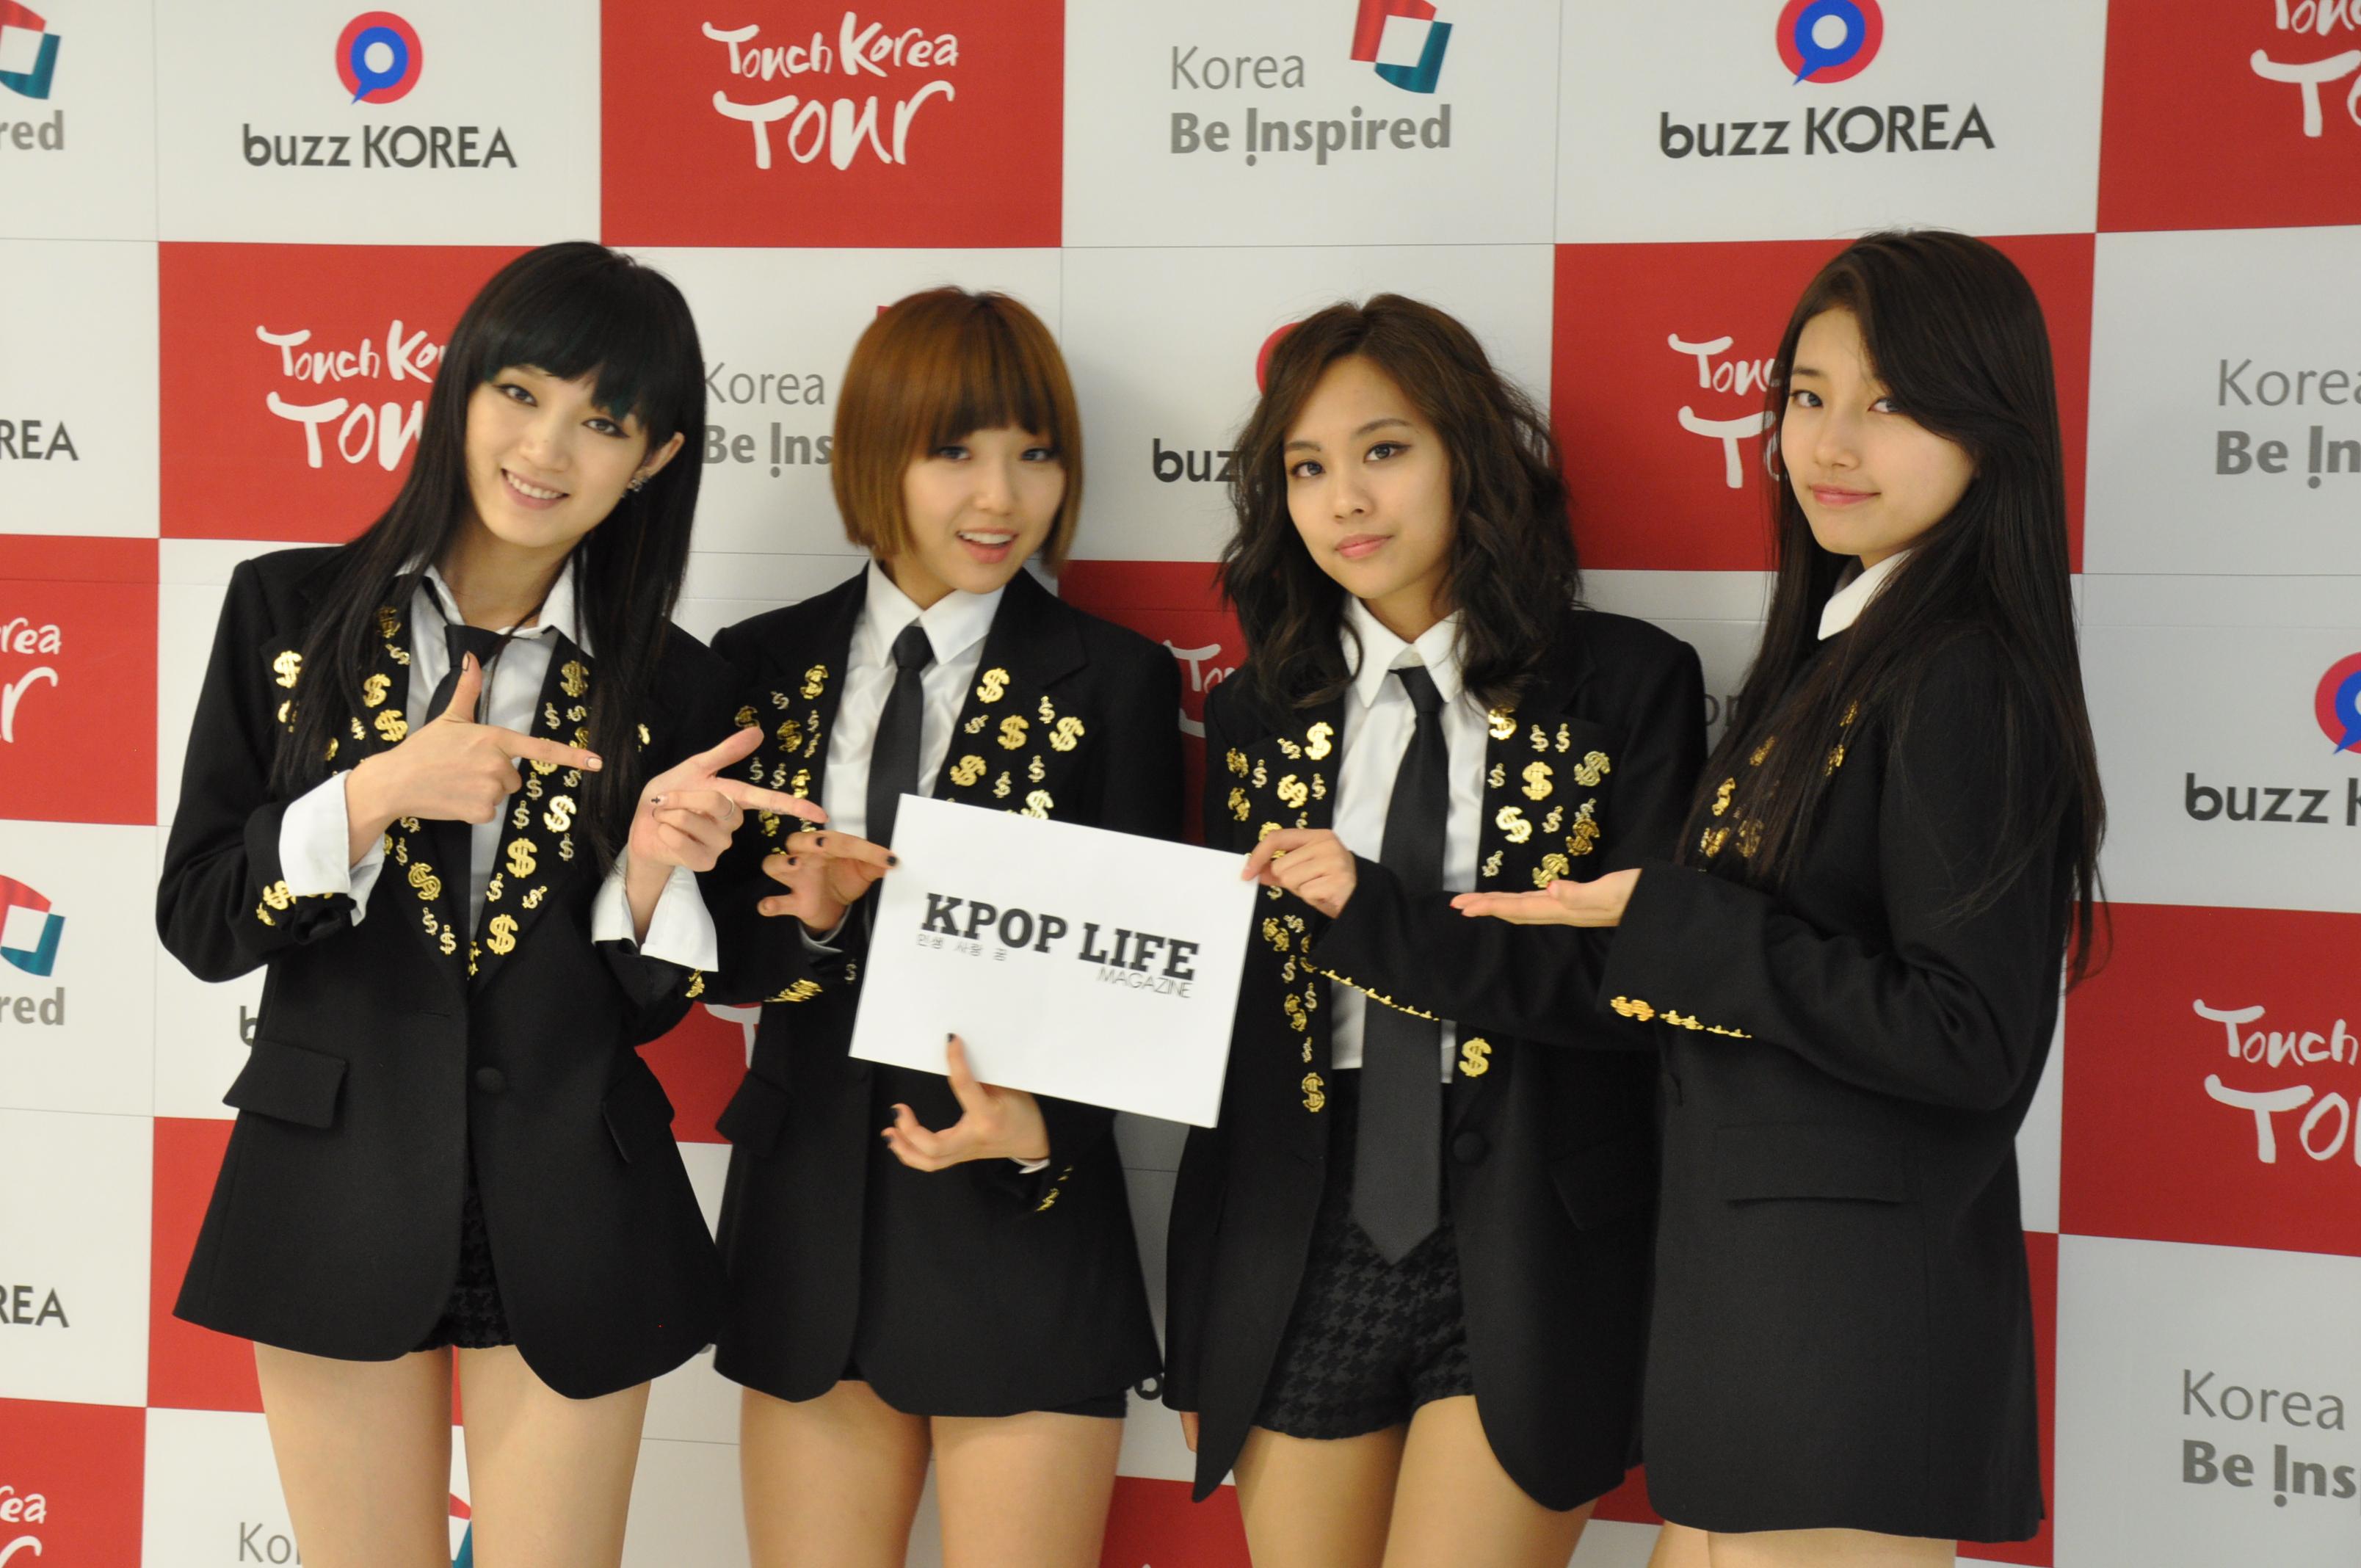 Miss A et Kpop Life